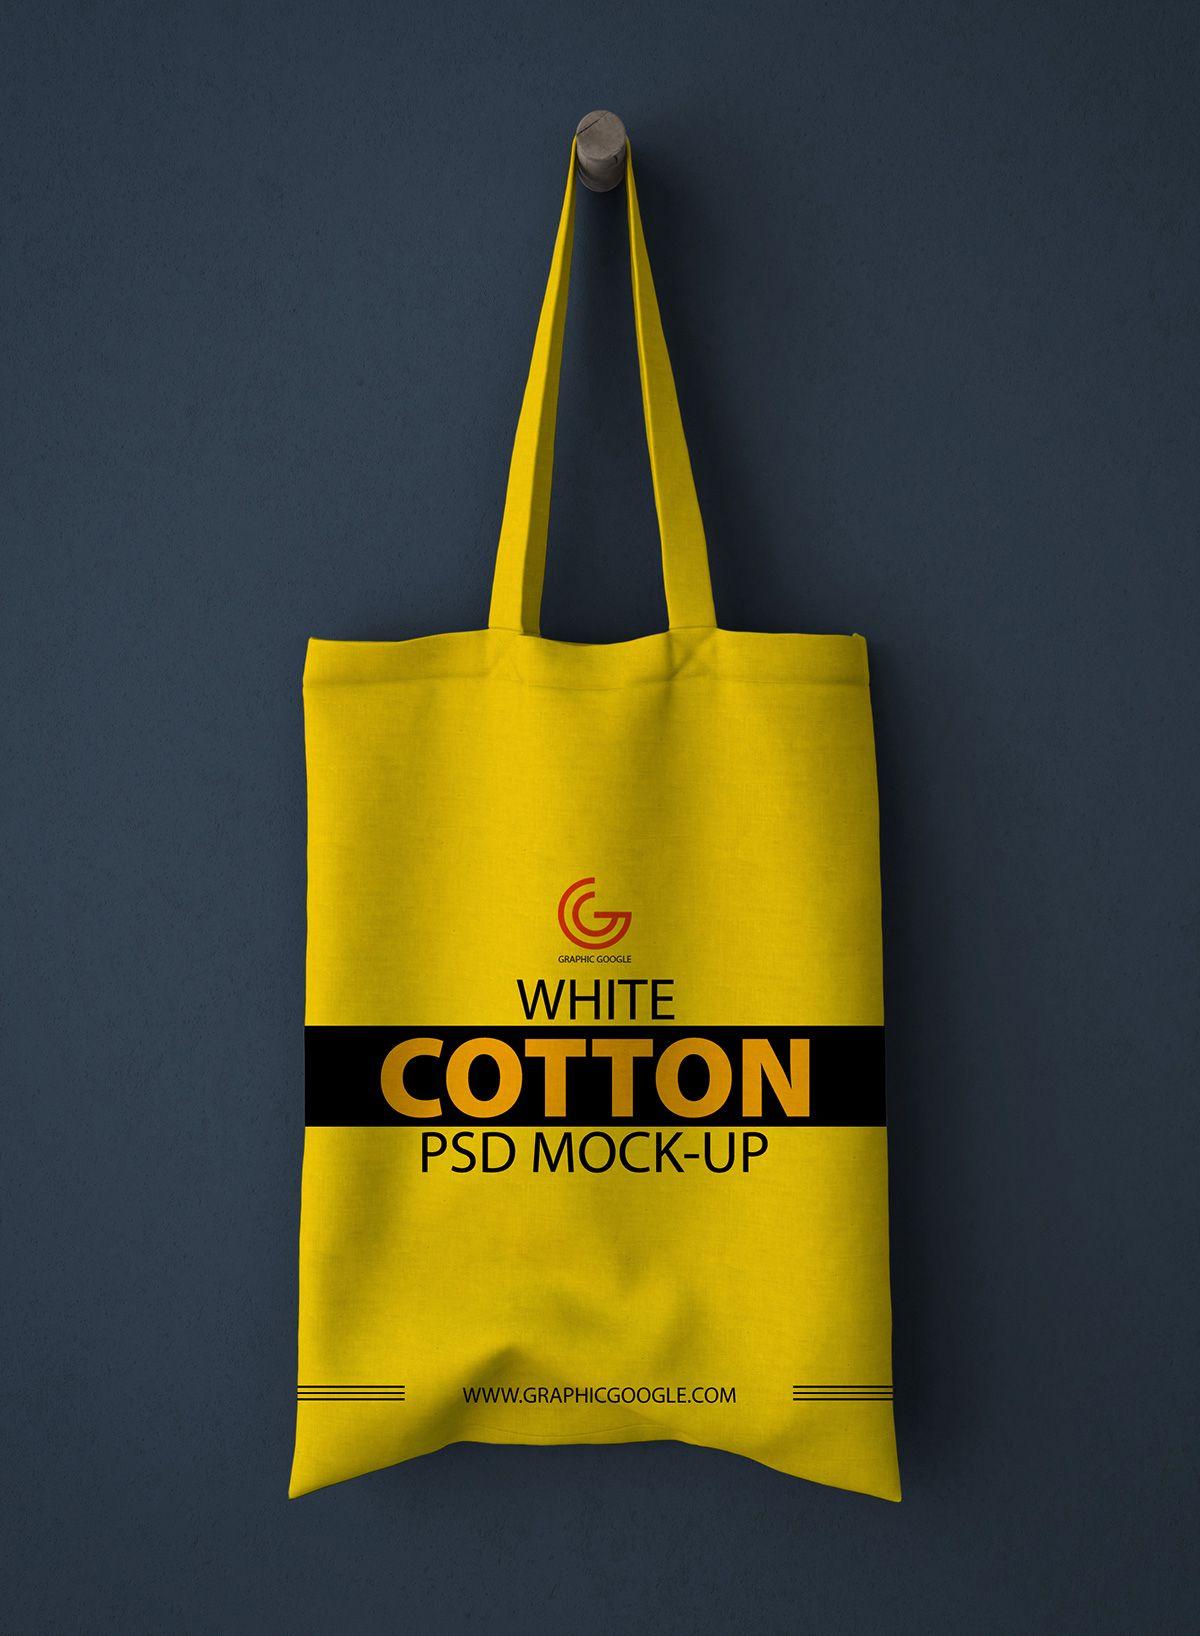 Download Free White Cotton Bag Psd Mockup 7 5 Mb Graphic Google Free Photoshop Mockup Psd Cotton Bag Tas